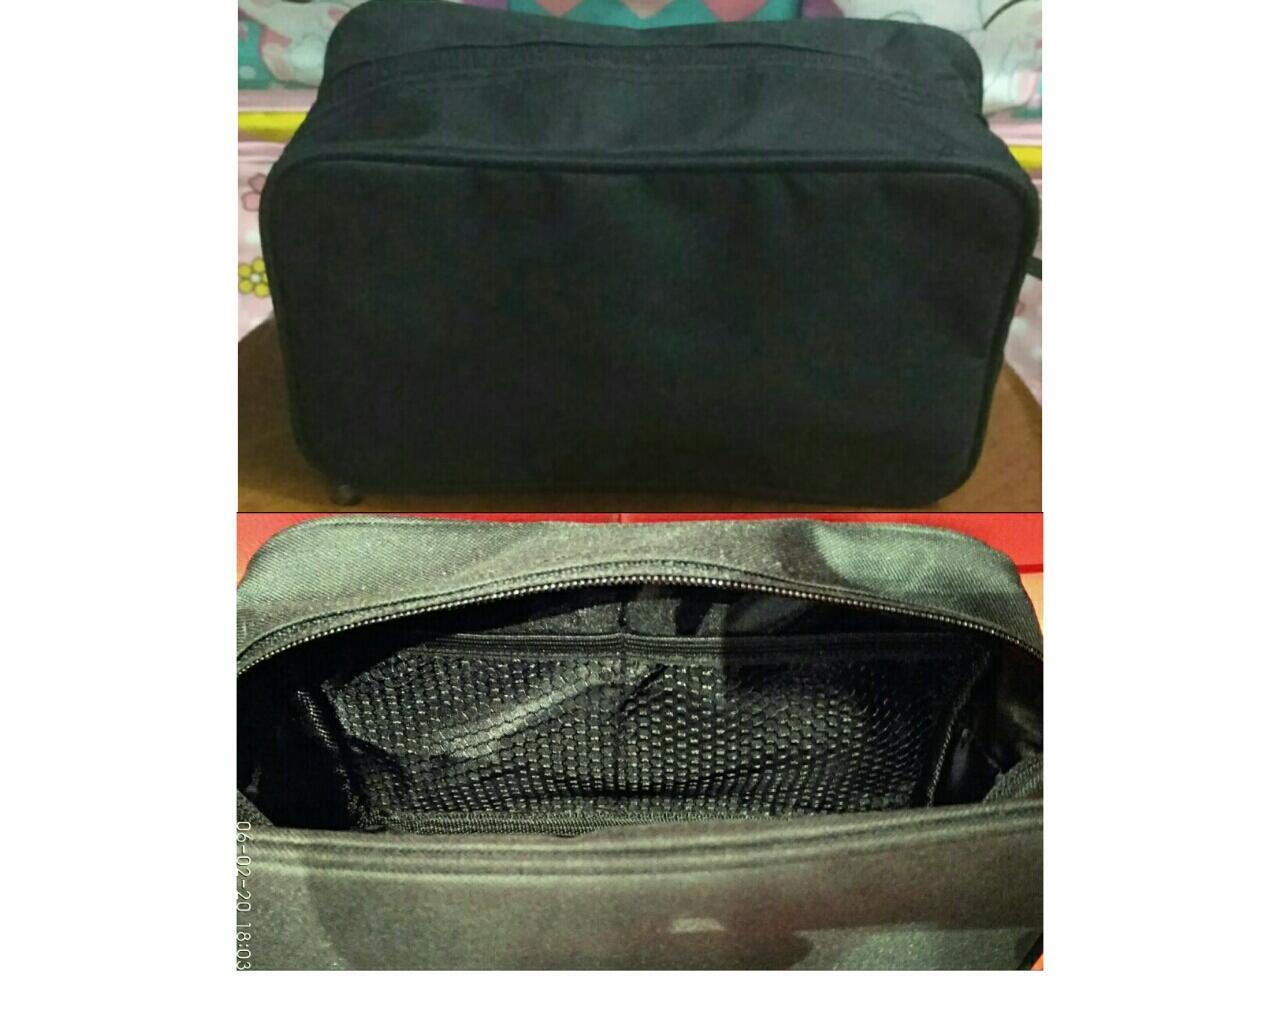 Clutch (Multigender Handbang) & Pouch (Toilettries Bag) By DBY Bags